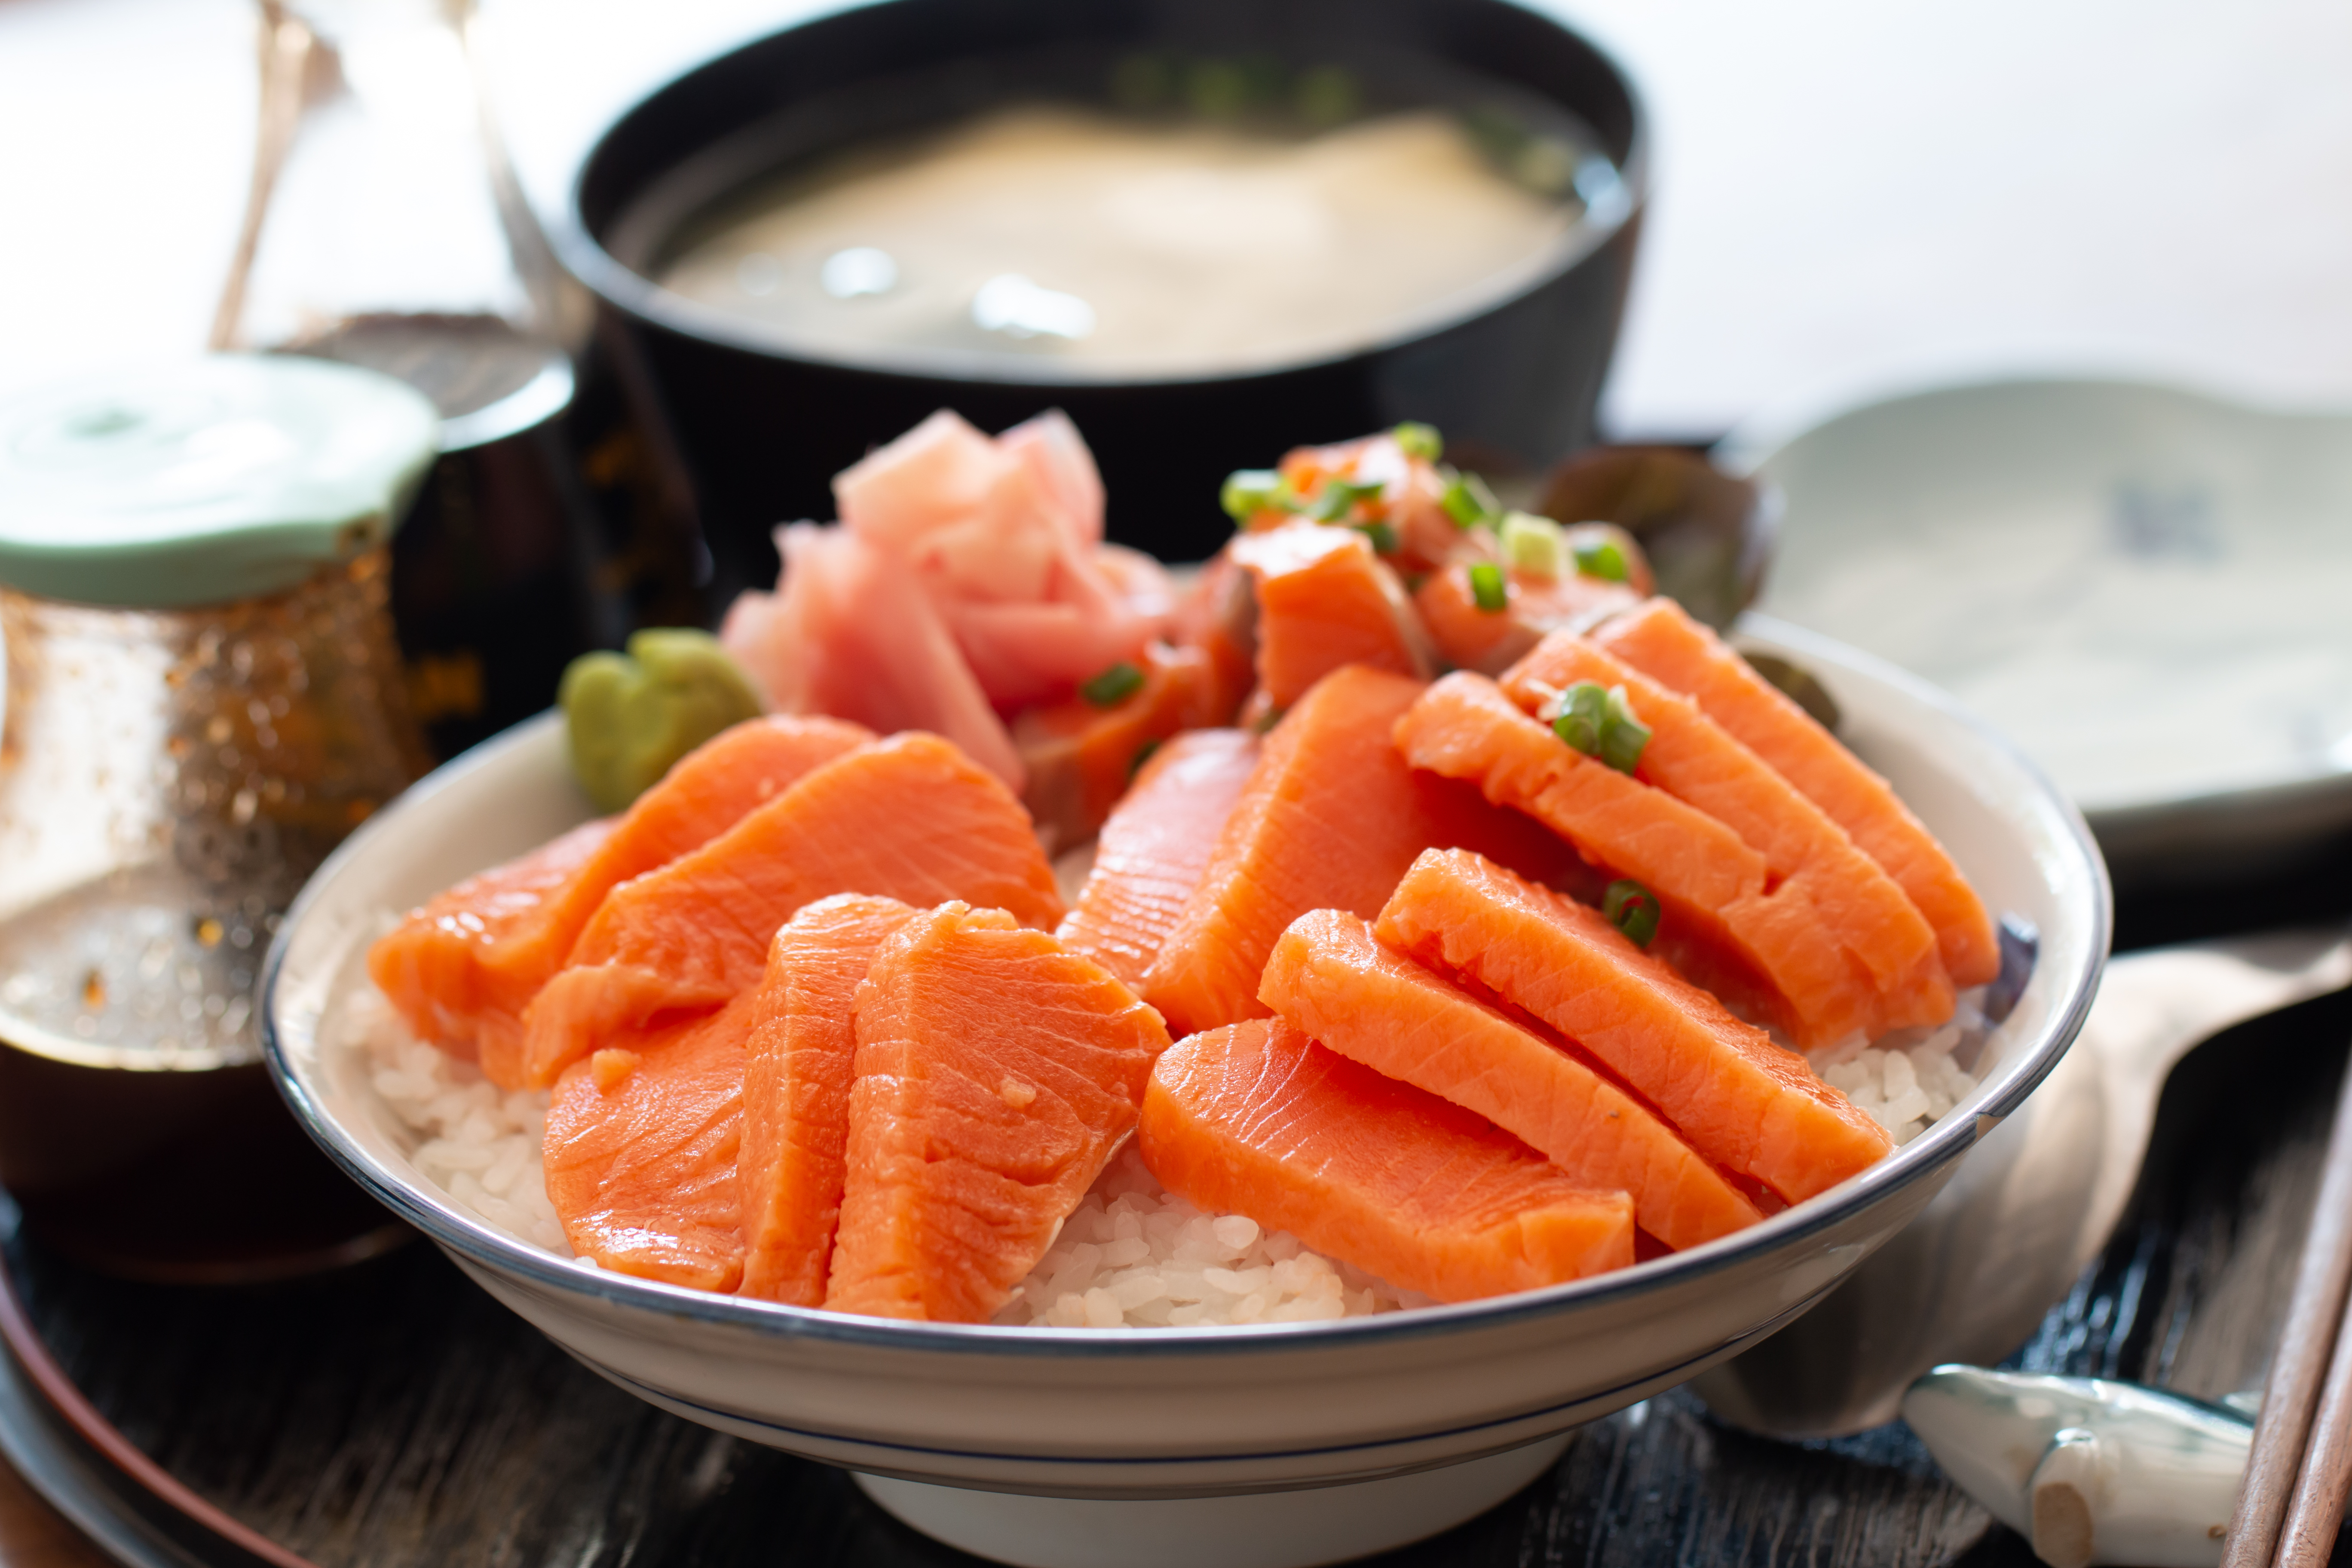 Salmon sashimi and salmon roe